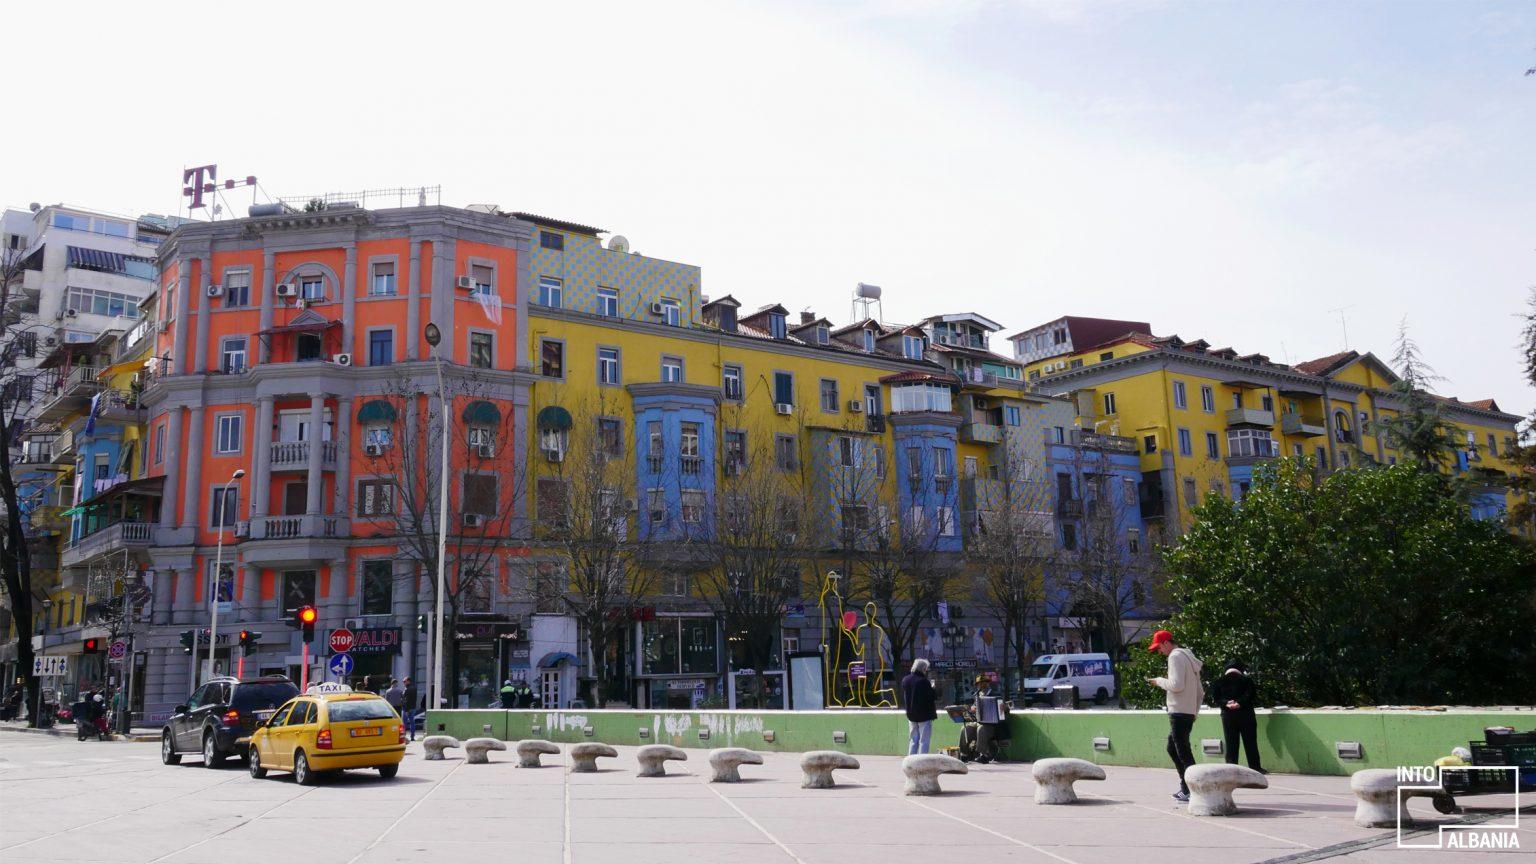 Agimi Buildings